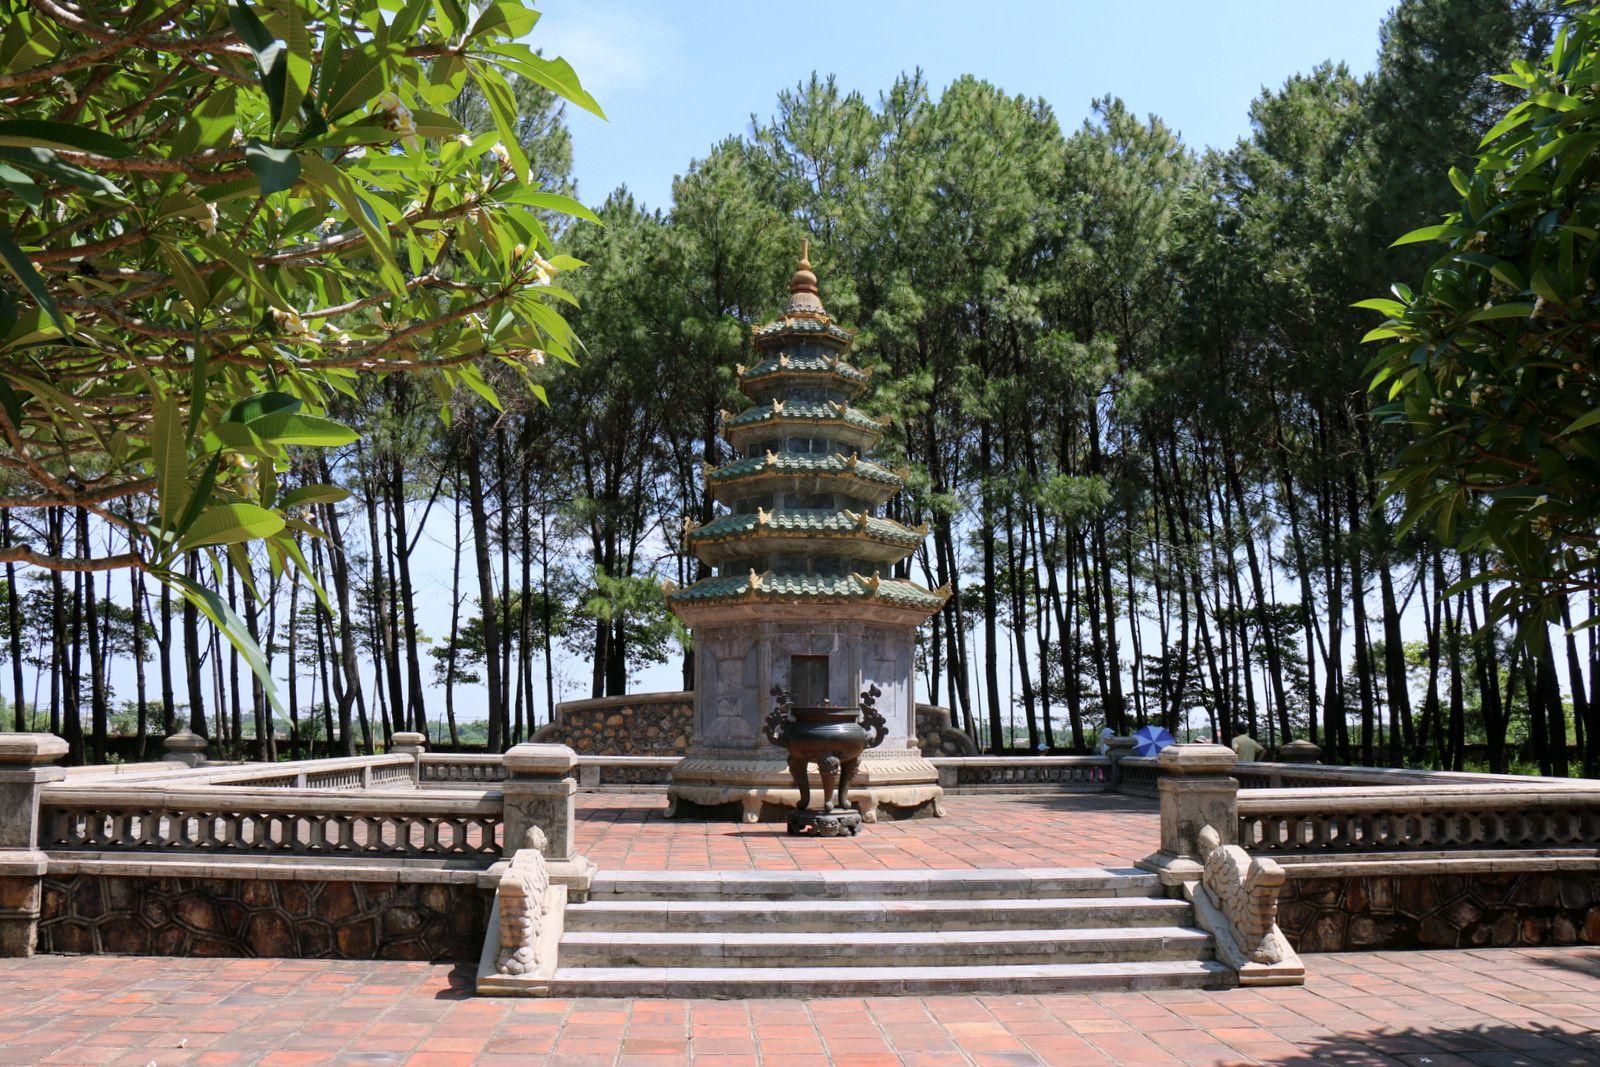 Dans les jardins de la Pagode de Thiên Mu (Vietnam),